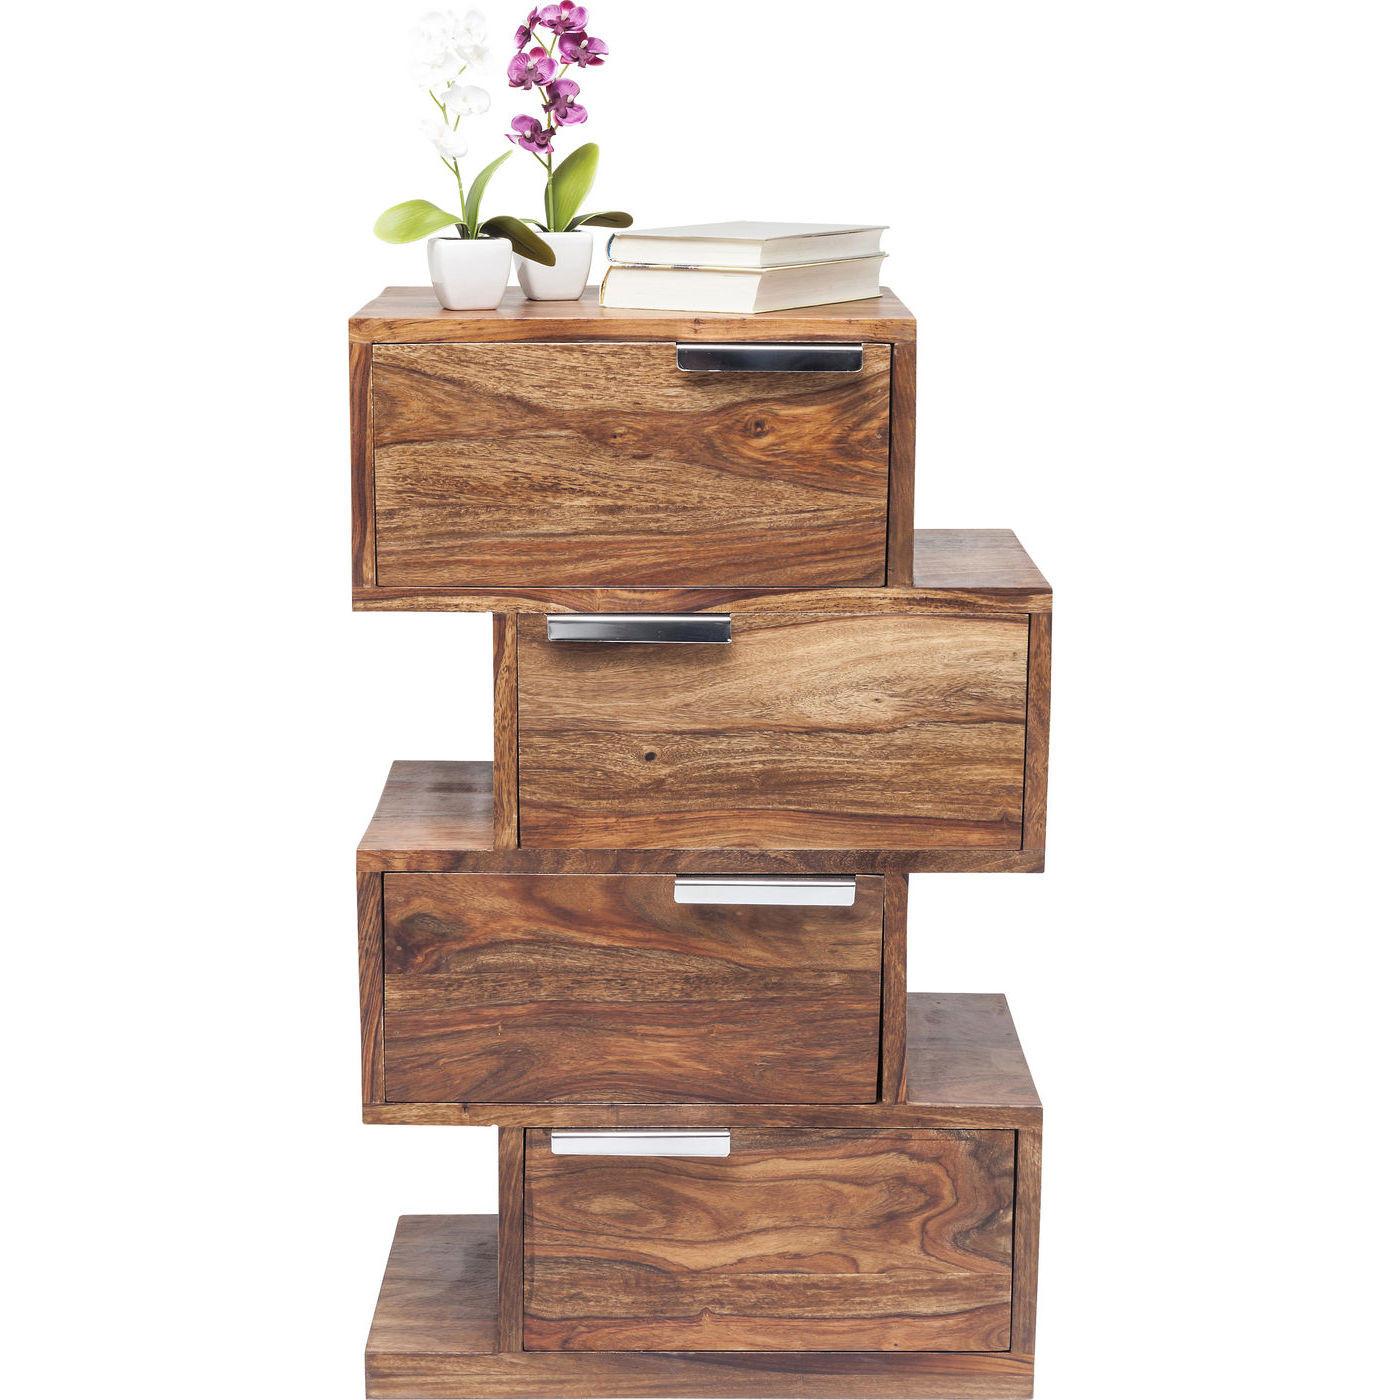 authentico kommode zick zack kare design mutoni m bel. Black Bedroom Furniture Sets. Home Design Ideas